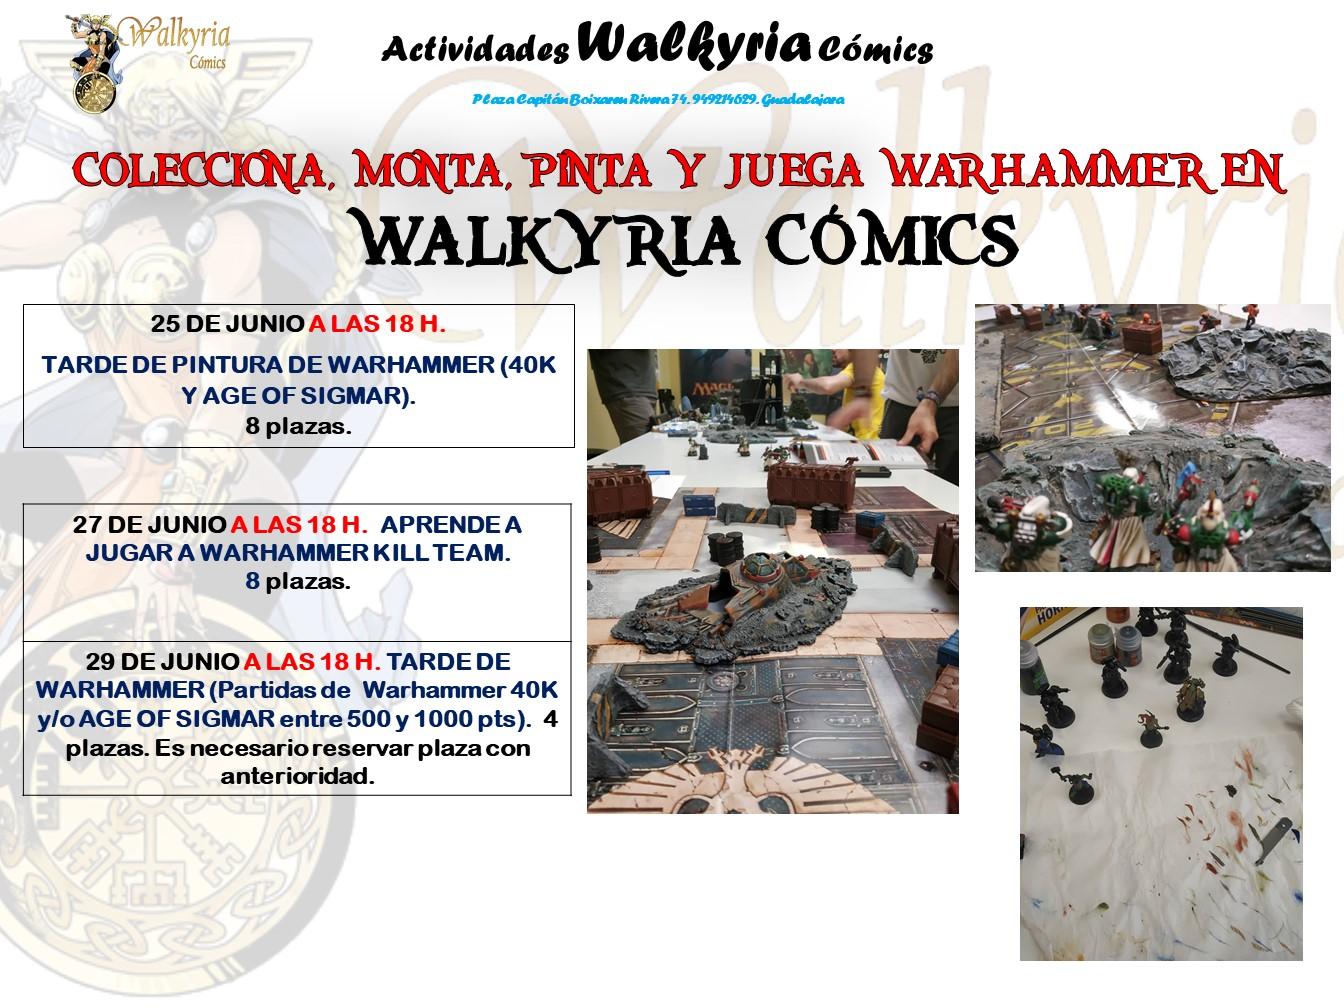 Juega a Warhammer en Walkyria Cómics